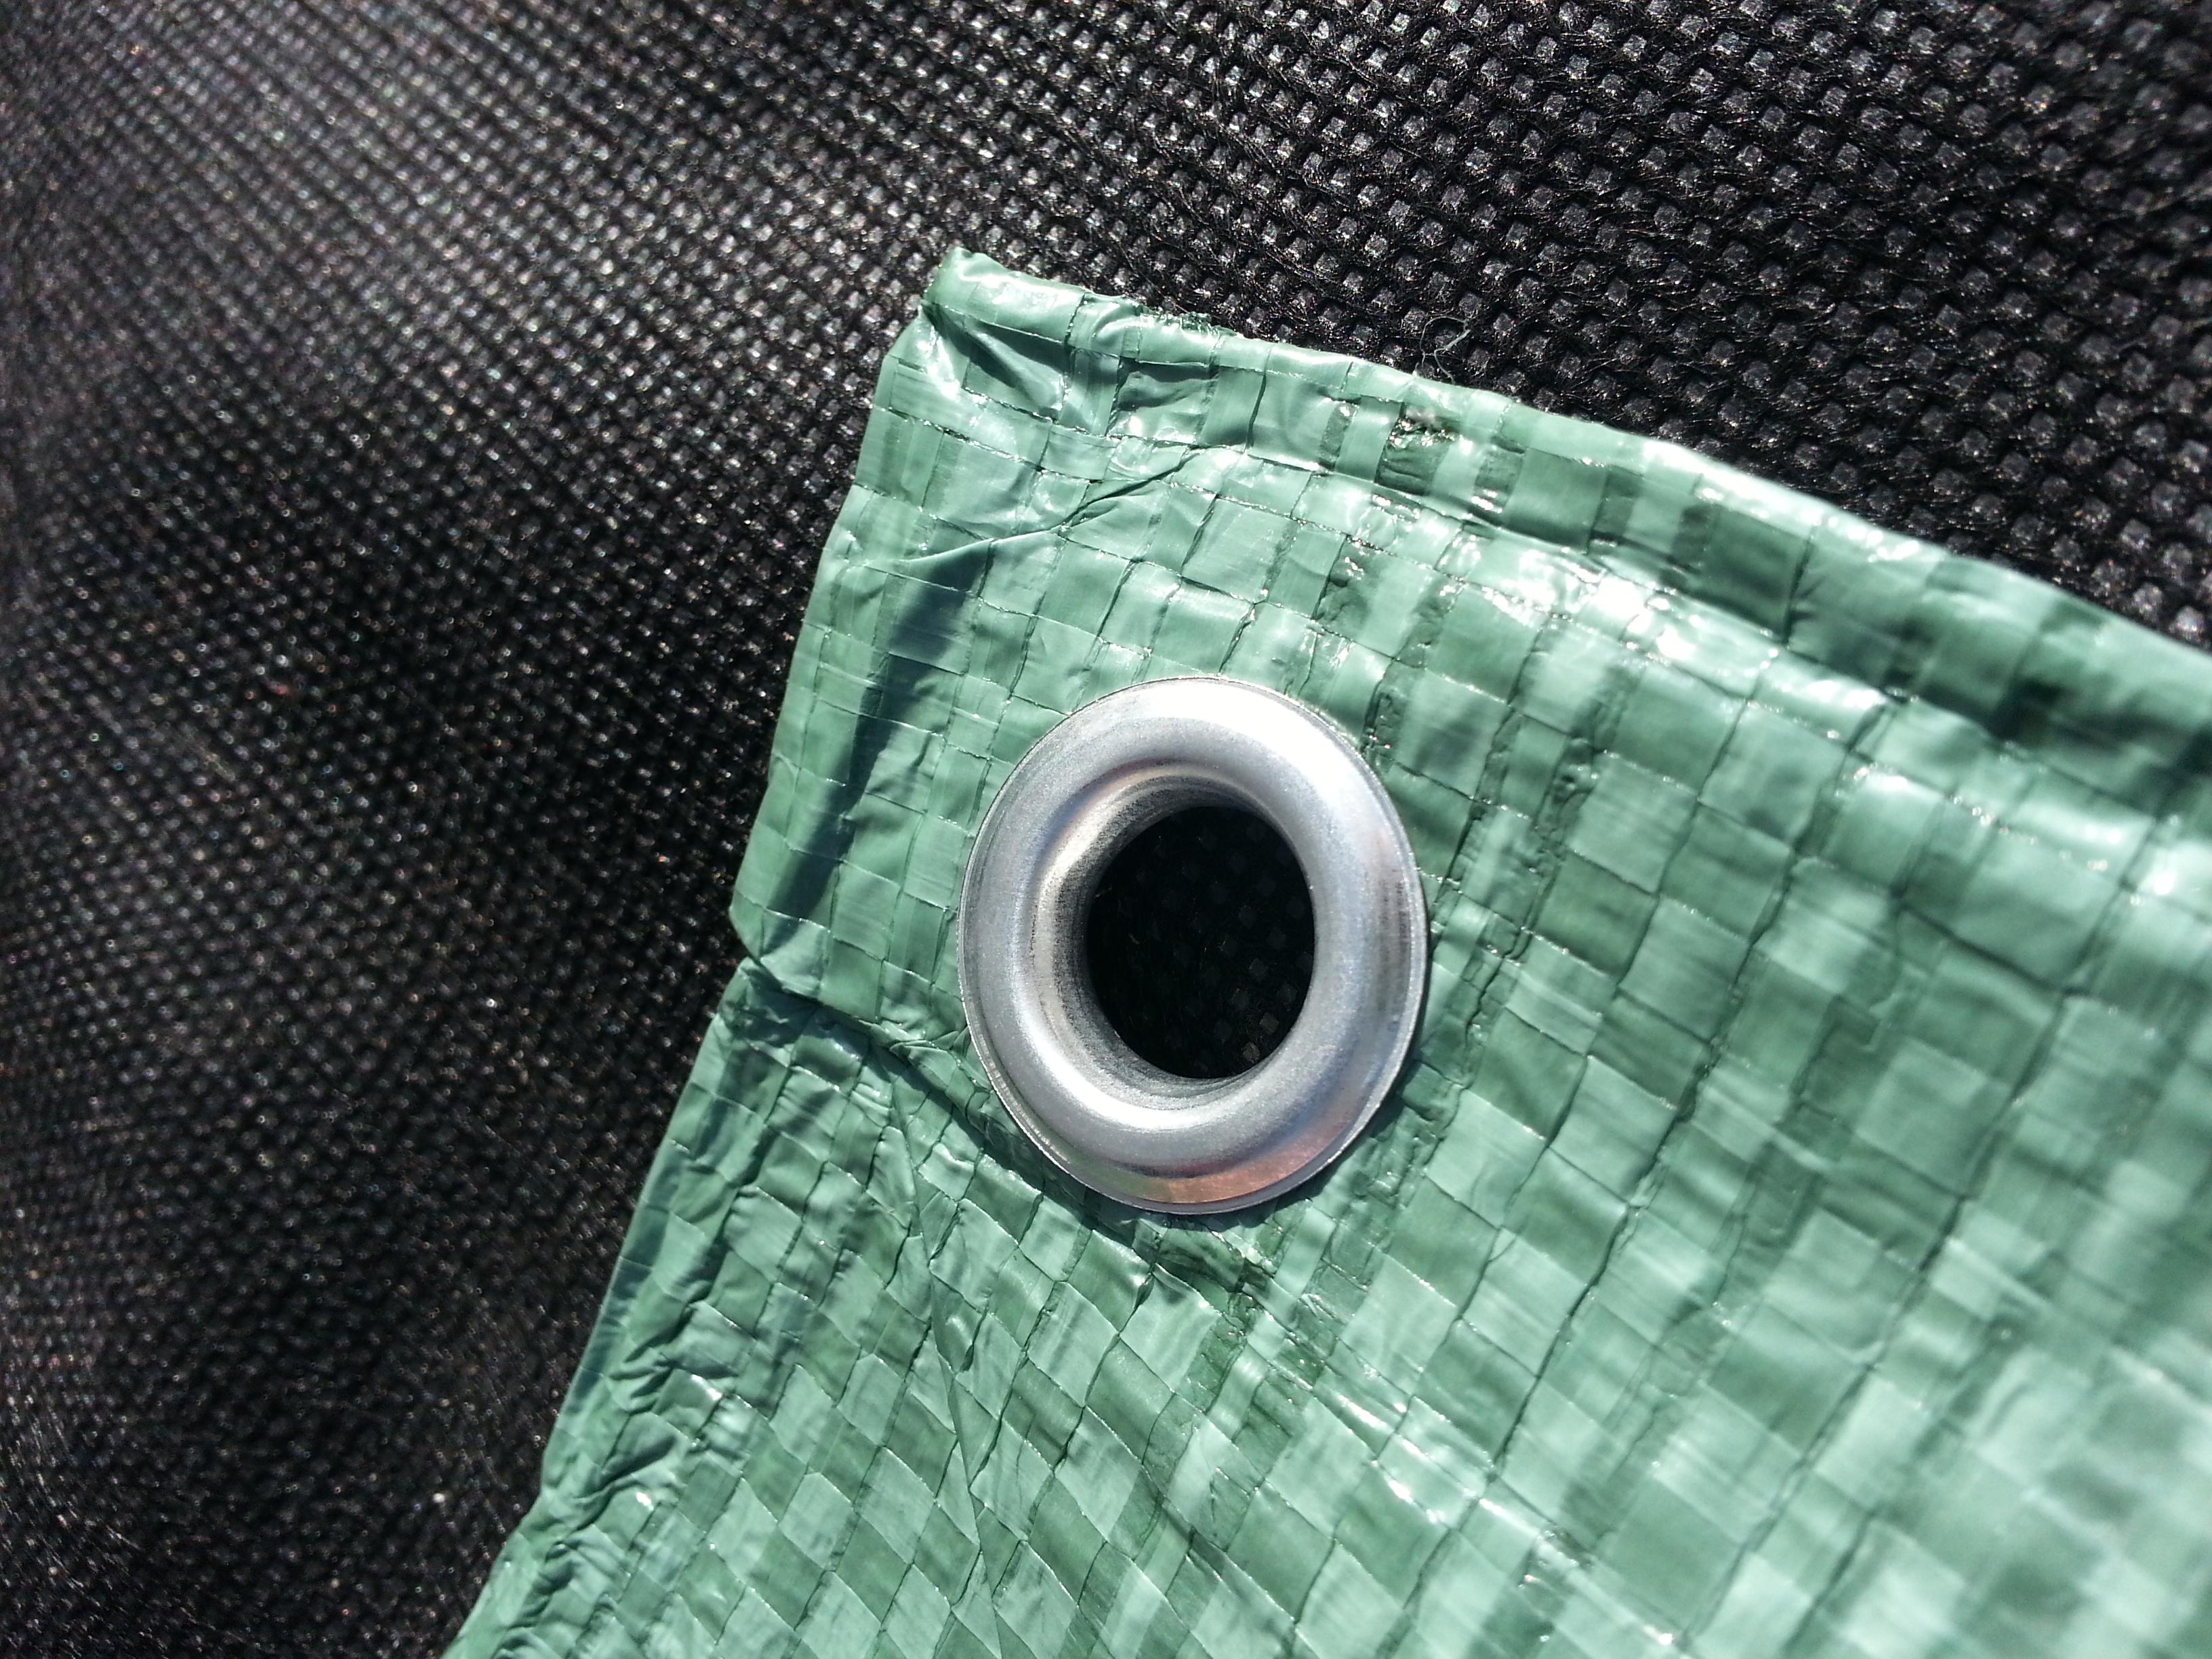 yuzet imperm ables b che couvre sol feuille l ger camping tarp conomie ebay. Black Bedroom Furniture Sets. Home Design Ideas